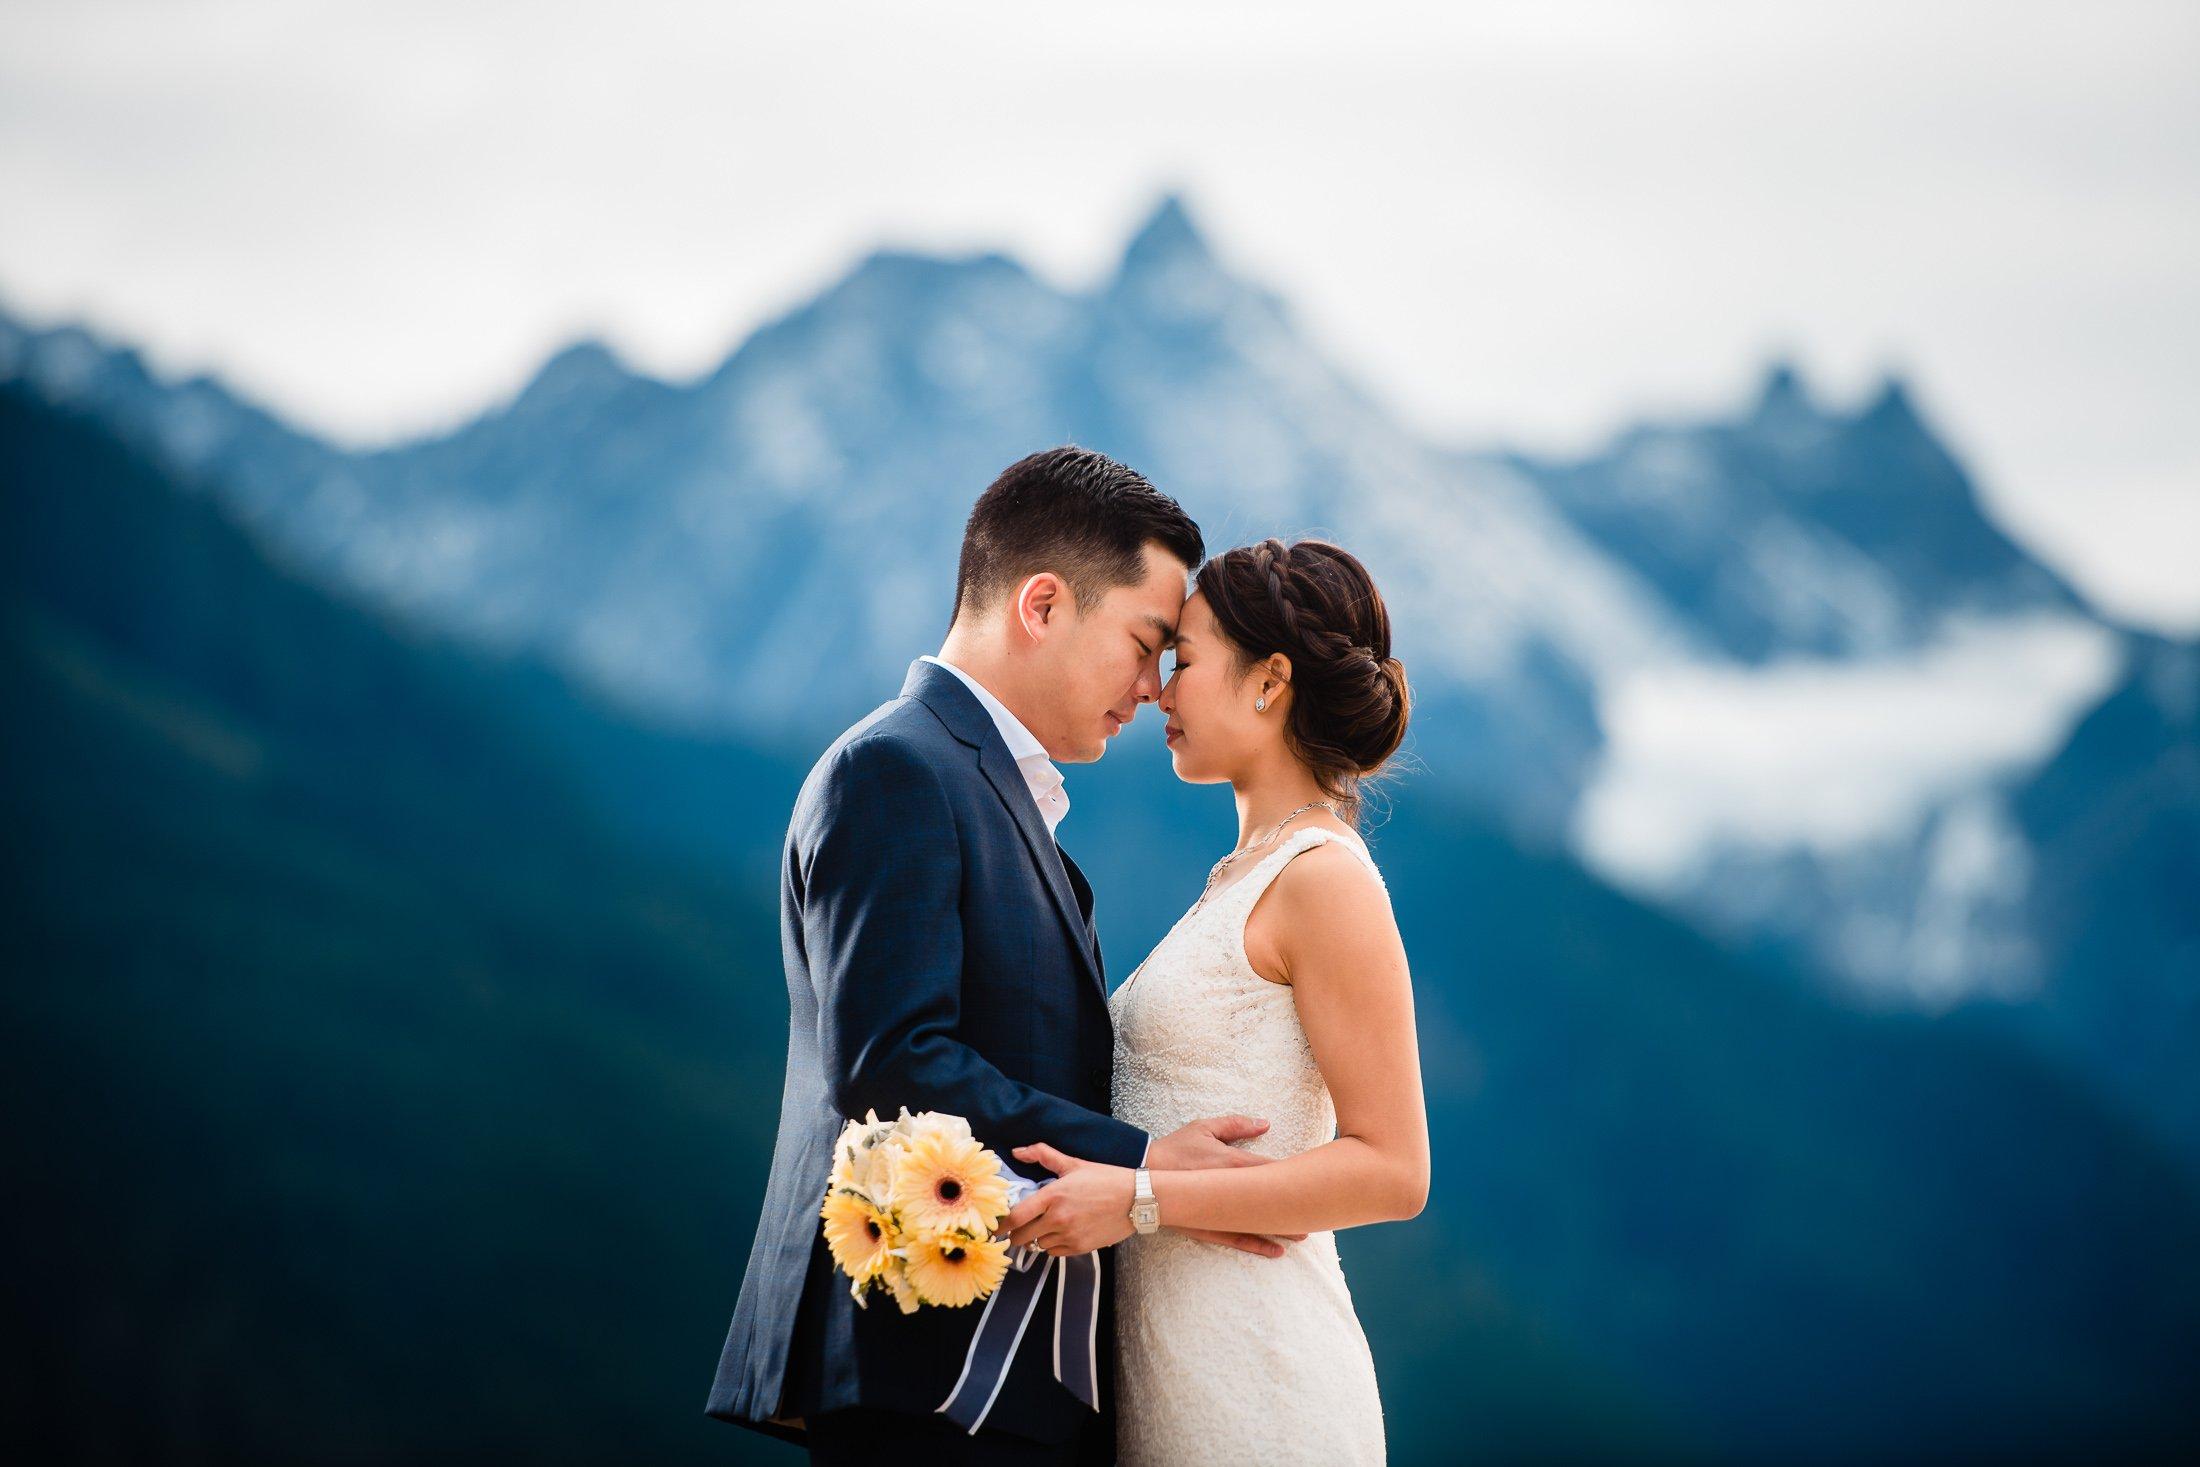 011 - vancouver adventure elopement photographers